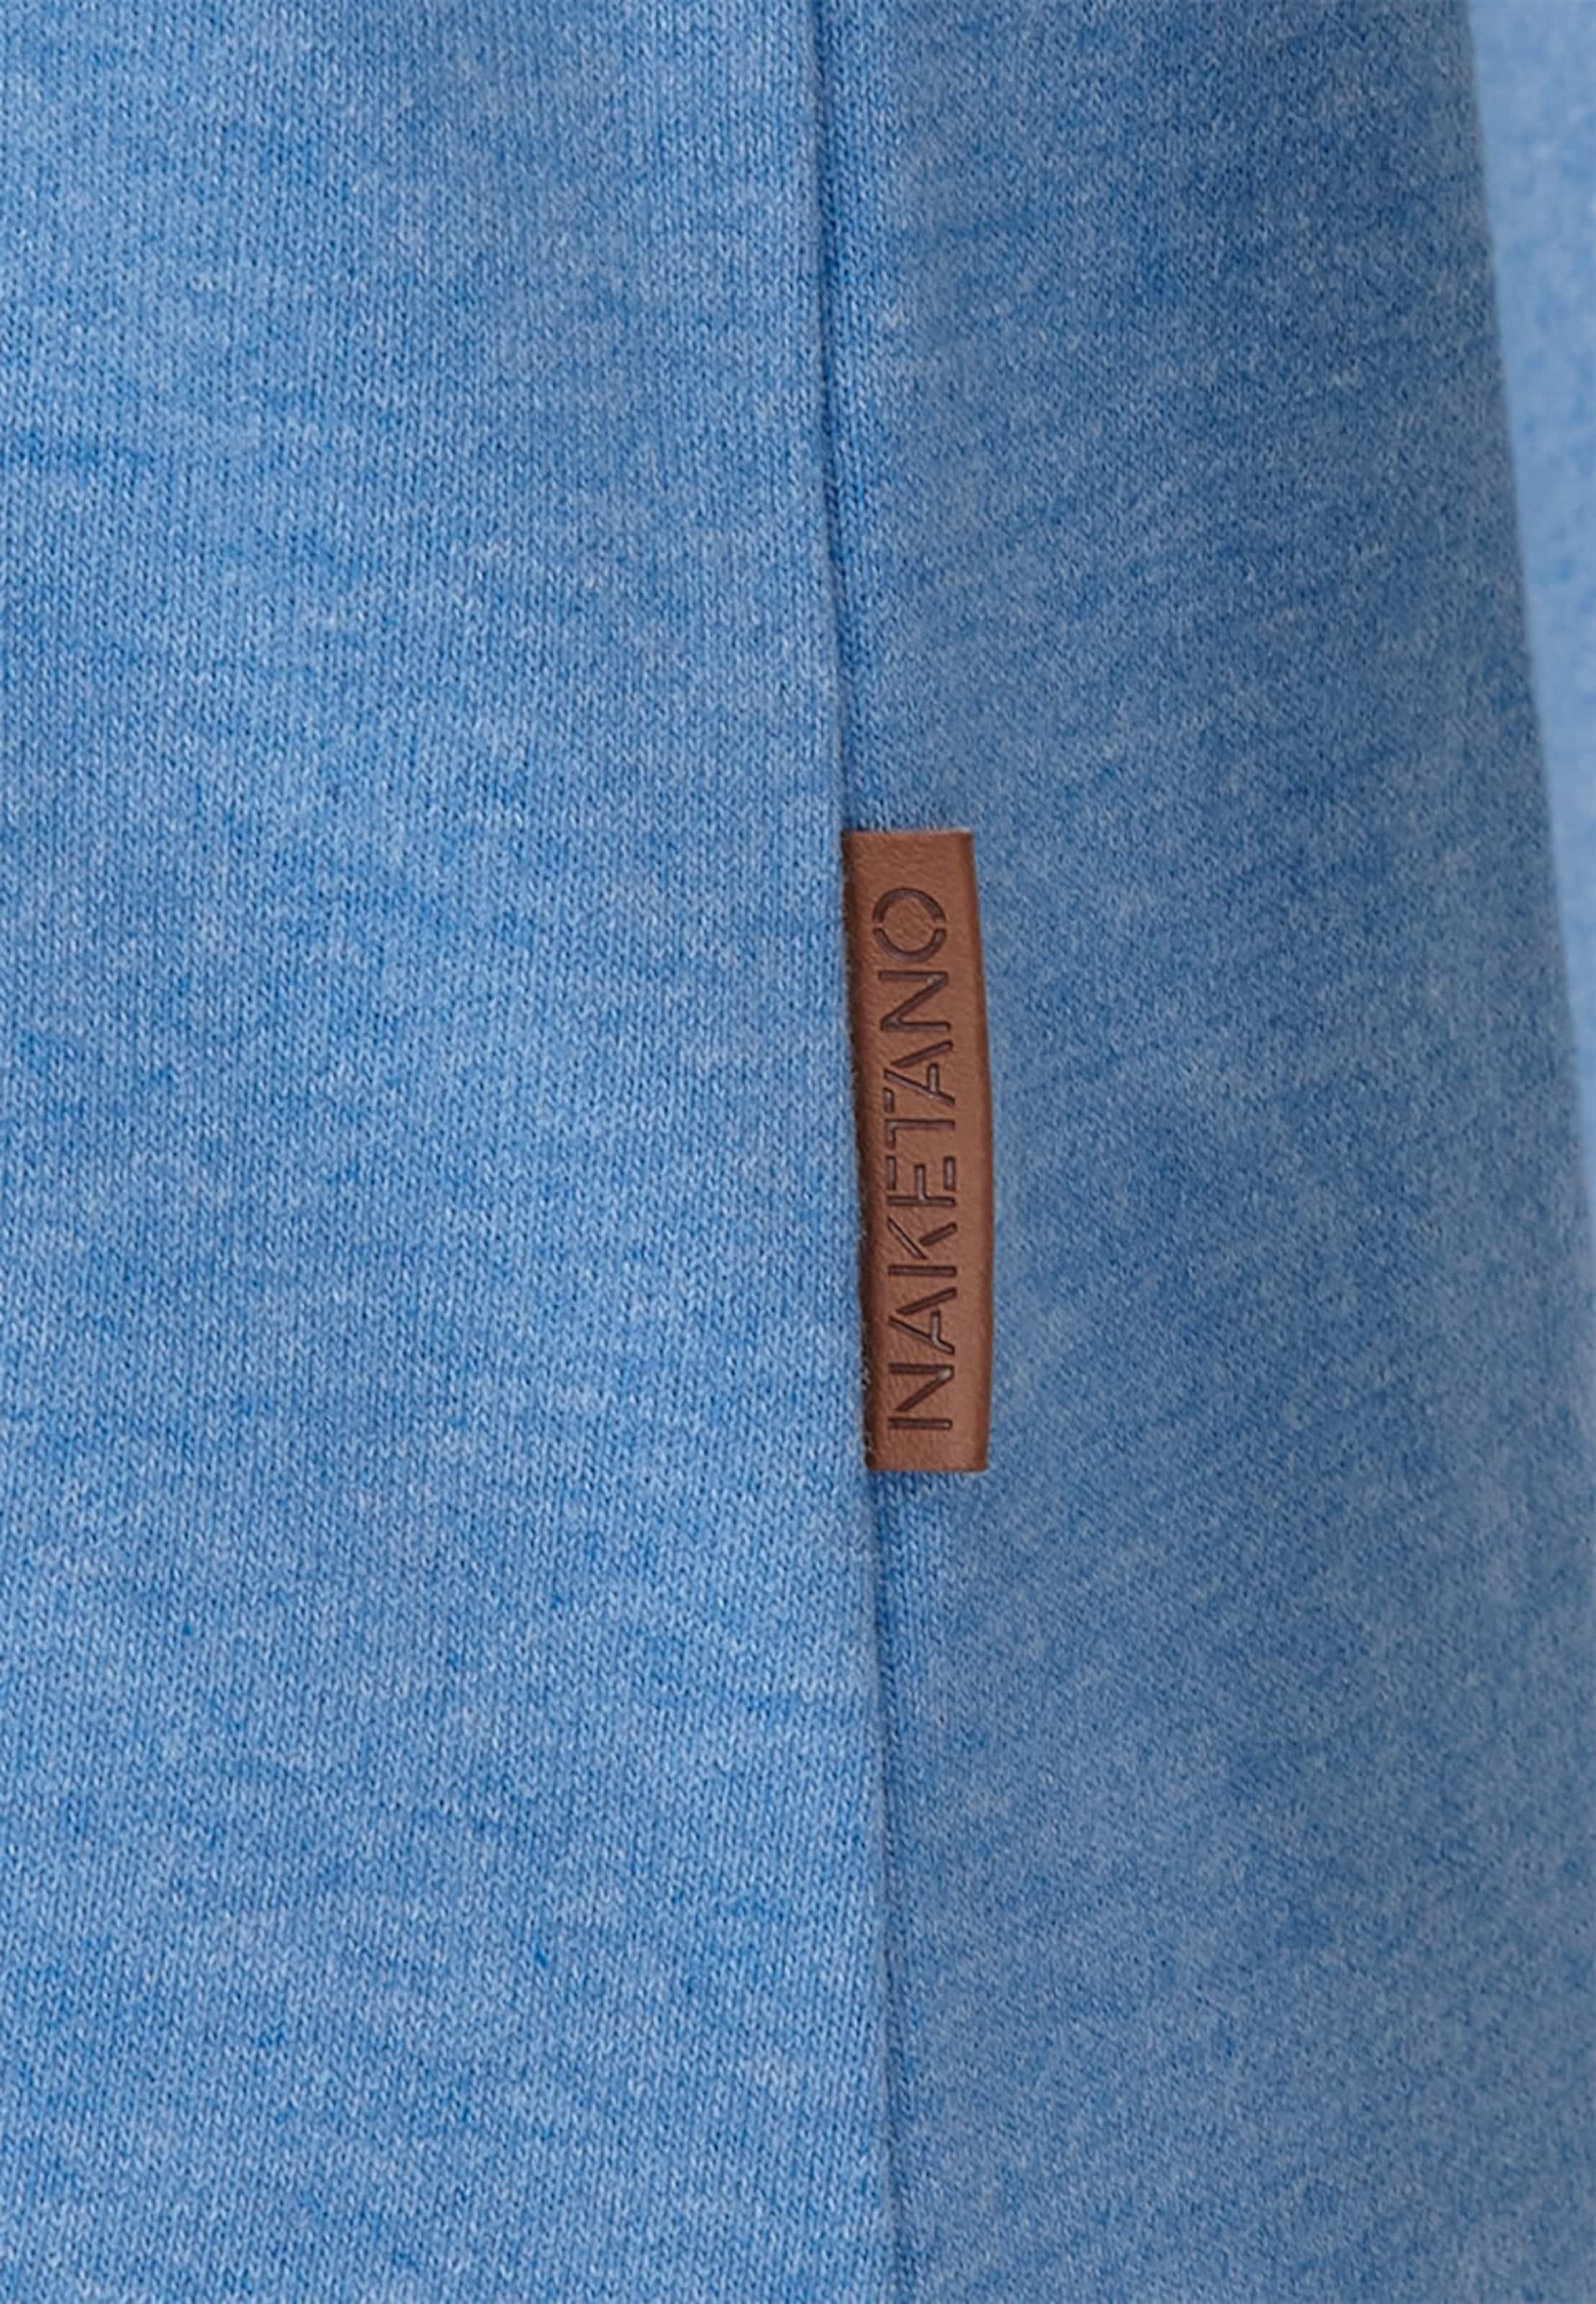 Naketano Bleu 'krokettenhorst' Sweat shirt Ciel En 7ymYgvIbf6